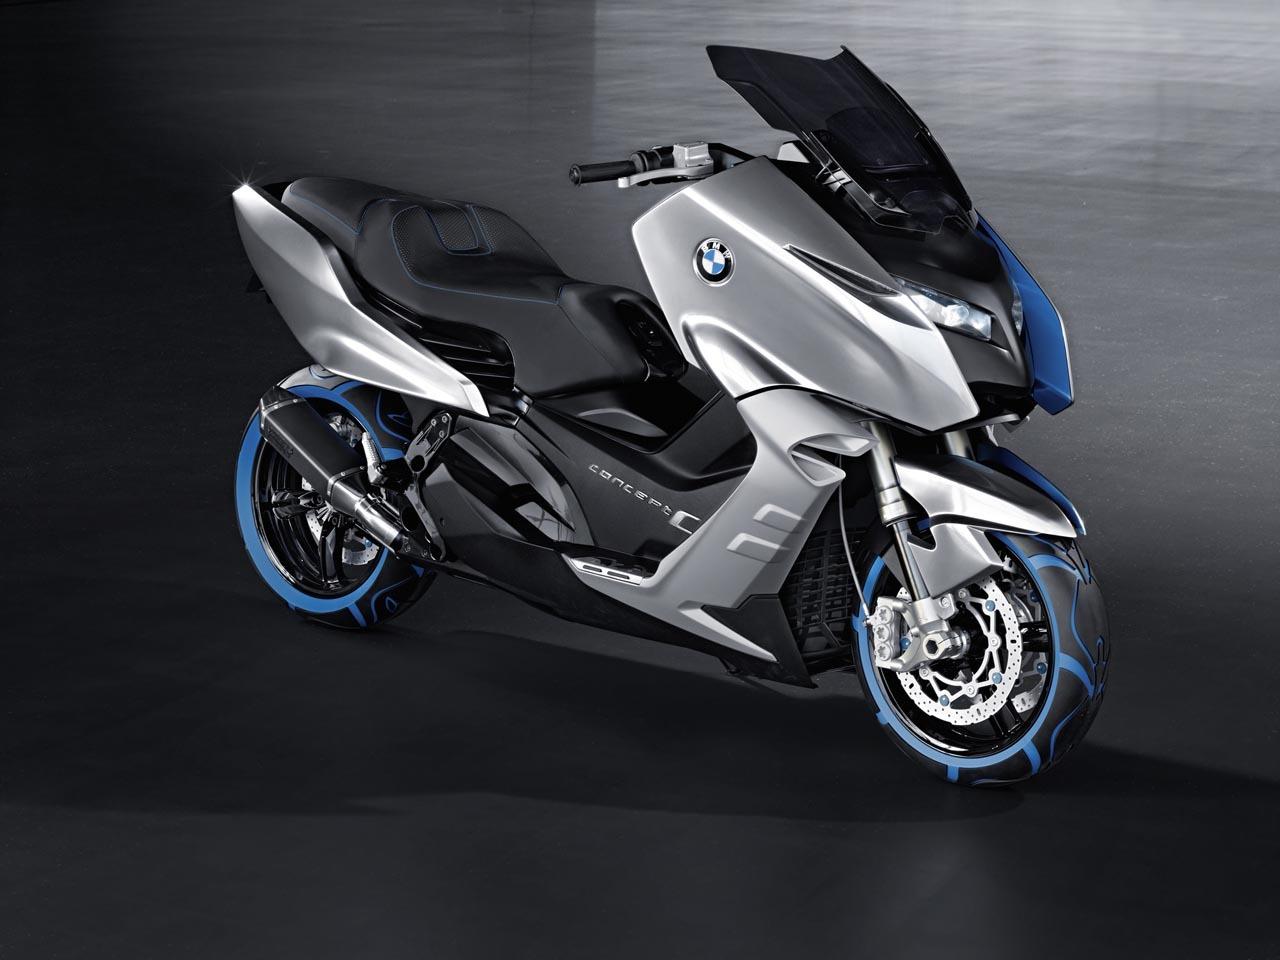 Foto de BMW Concept C Scooter, el Scooter del futuro según BMW (8/19)